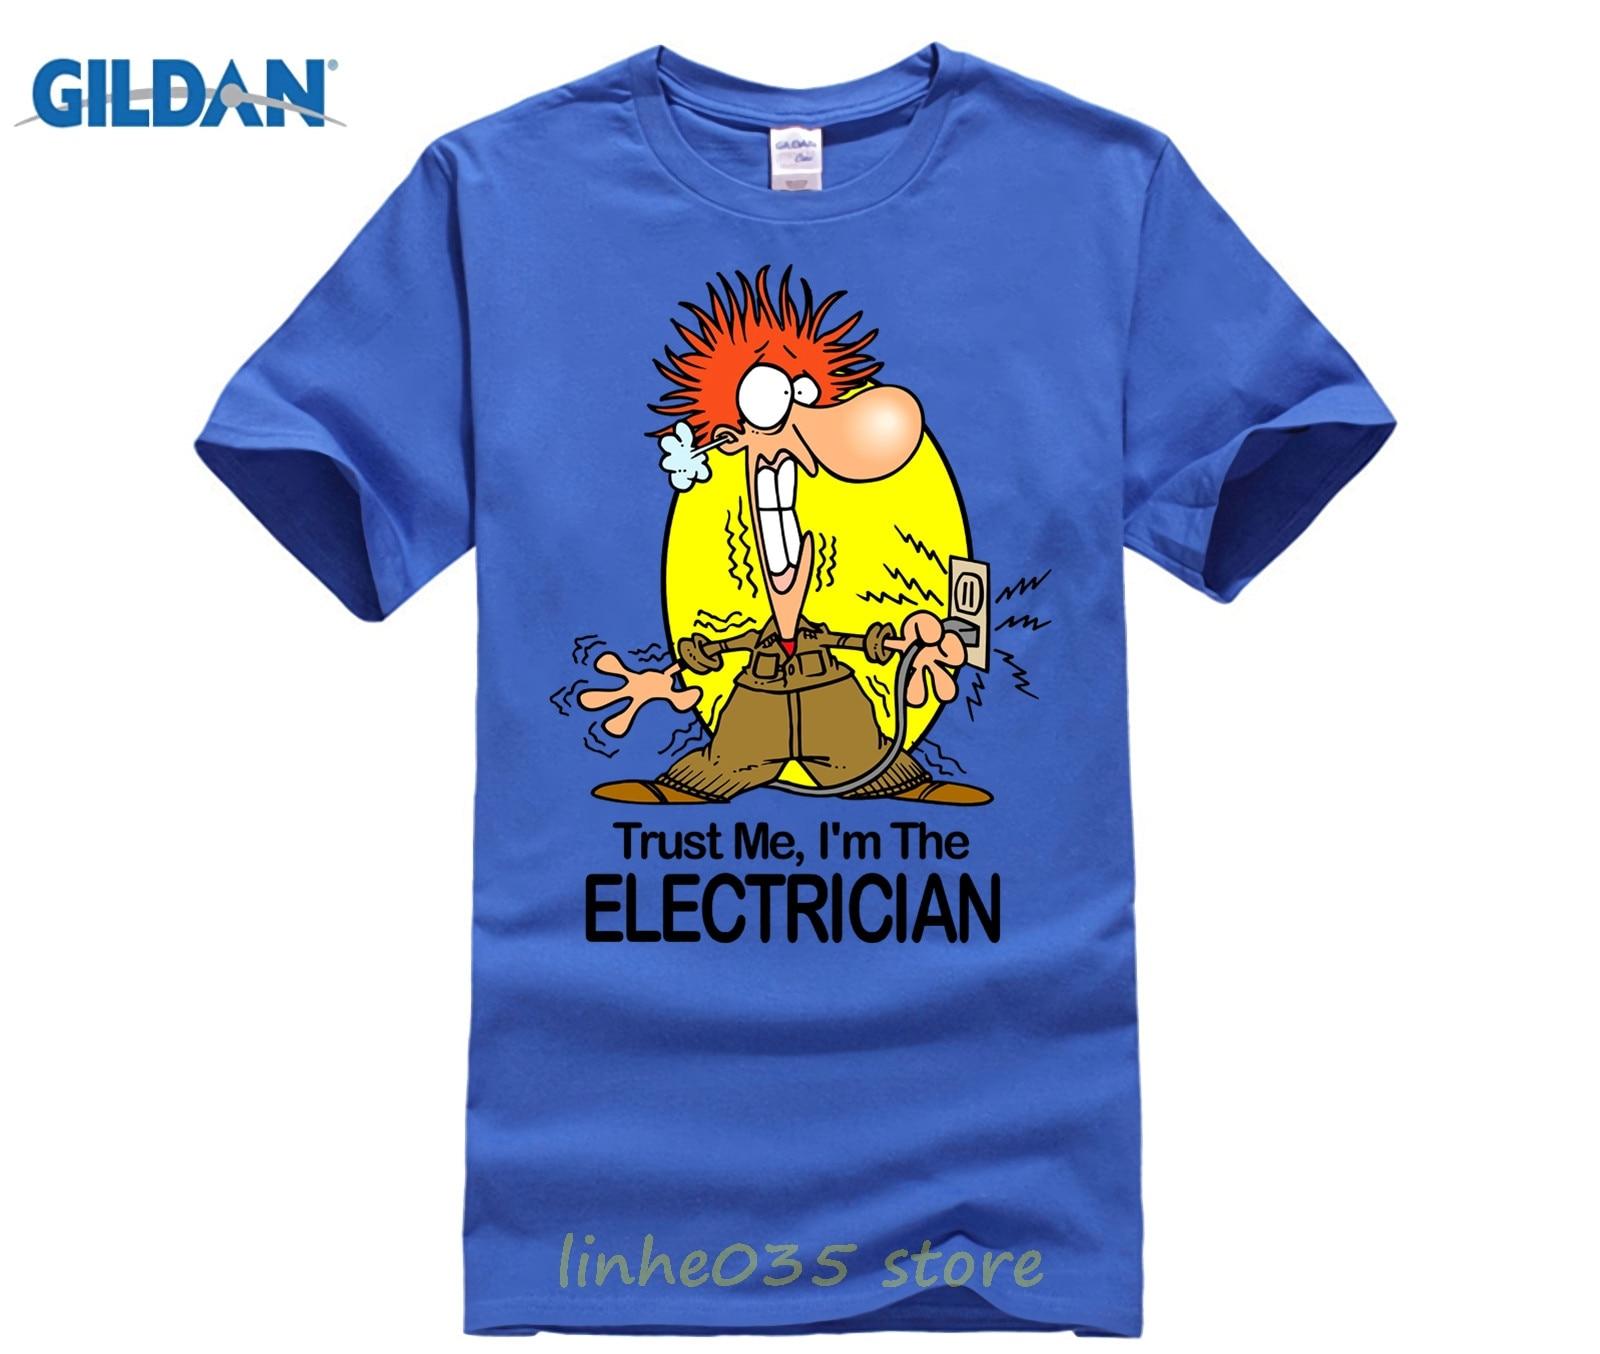 5ea977ea9b MENS FUNNY COOL NOVELTY ELECTRICIAN SPARKY NEW JOB T-SHIRTS JOKE GIFTS  PRESENTS Funny Clothing